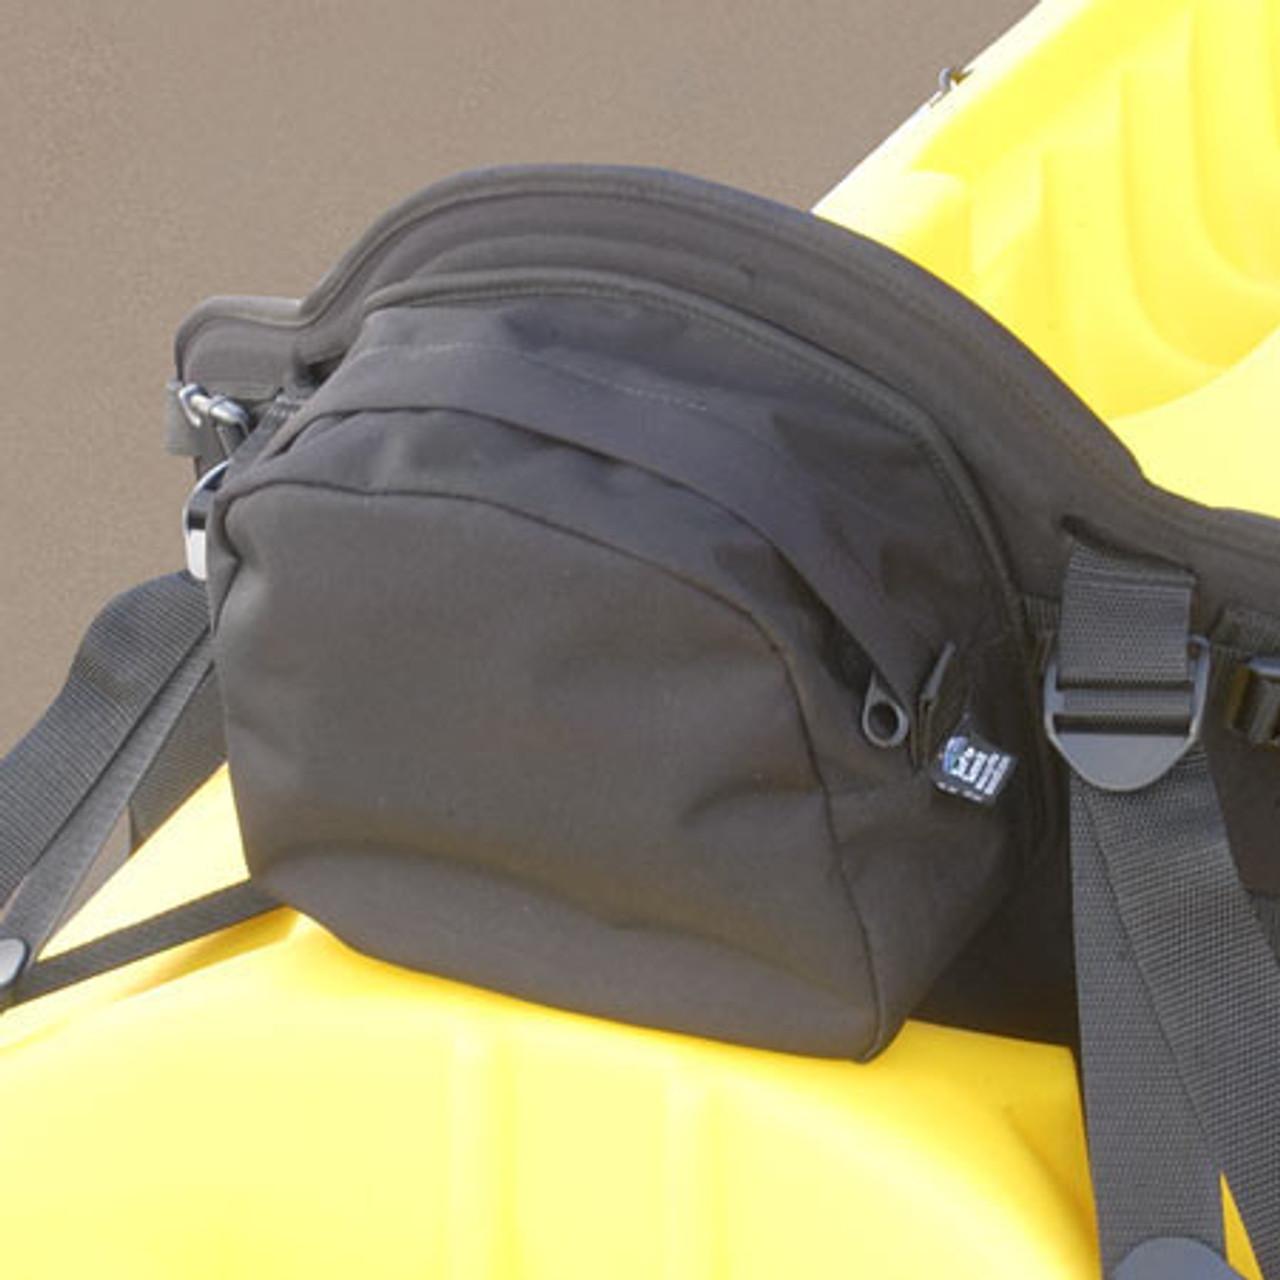 GTS Elite Molded Foam Kayak Seat - Standard Pack